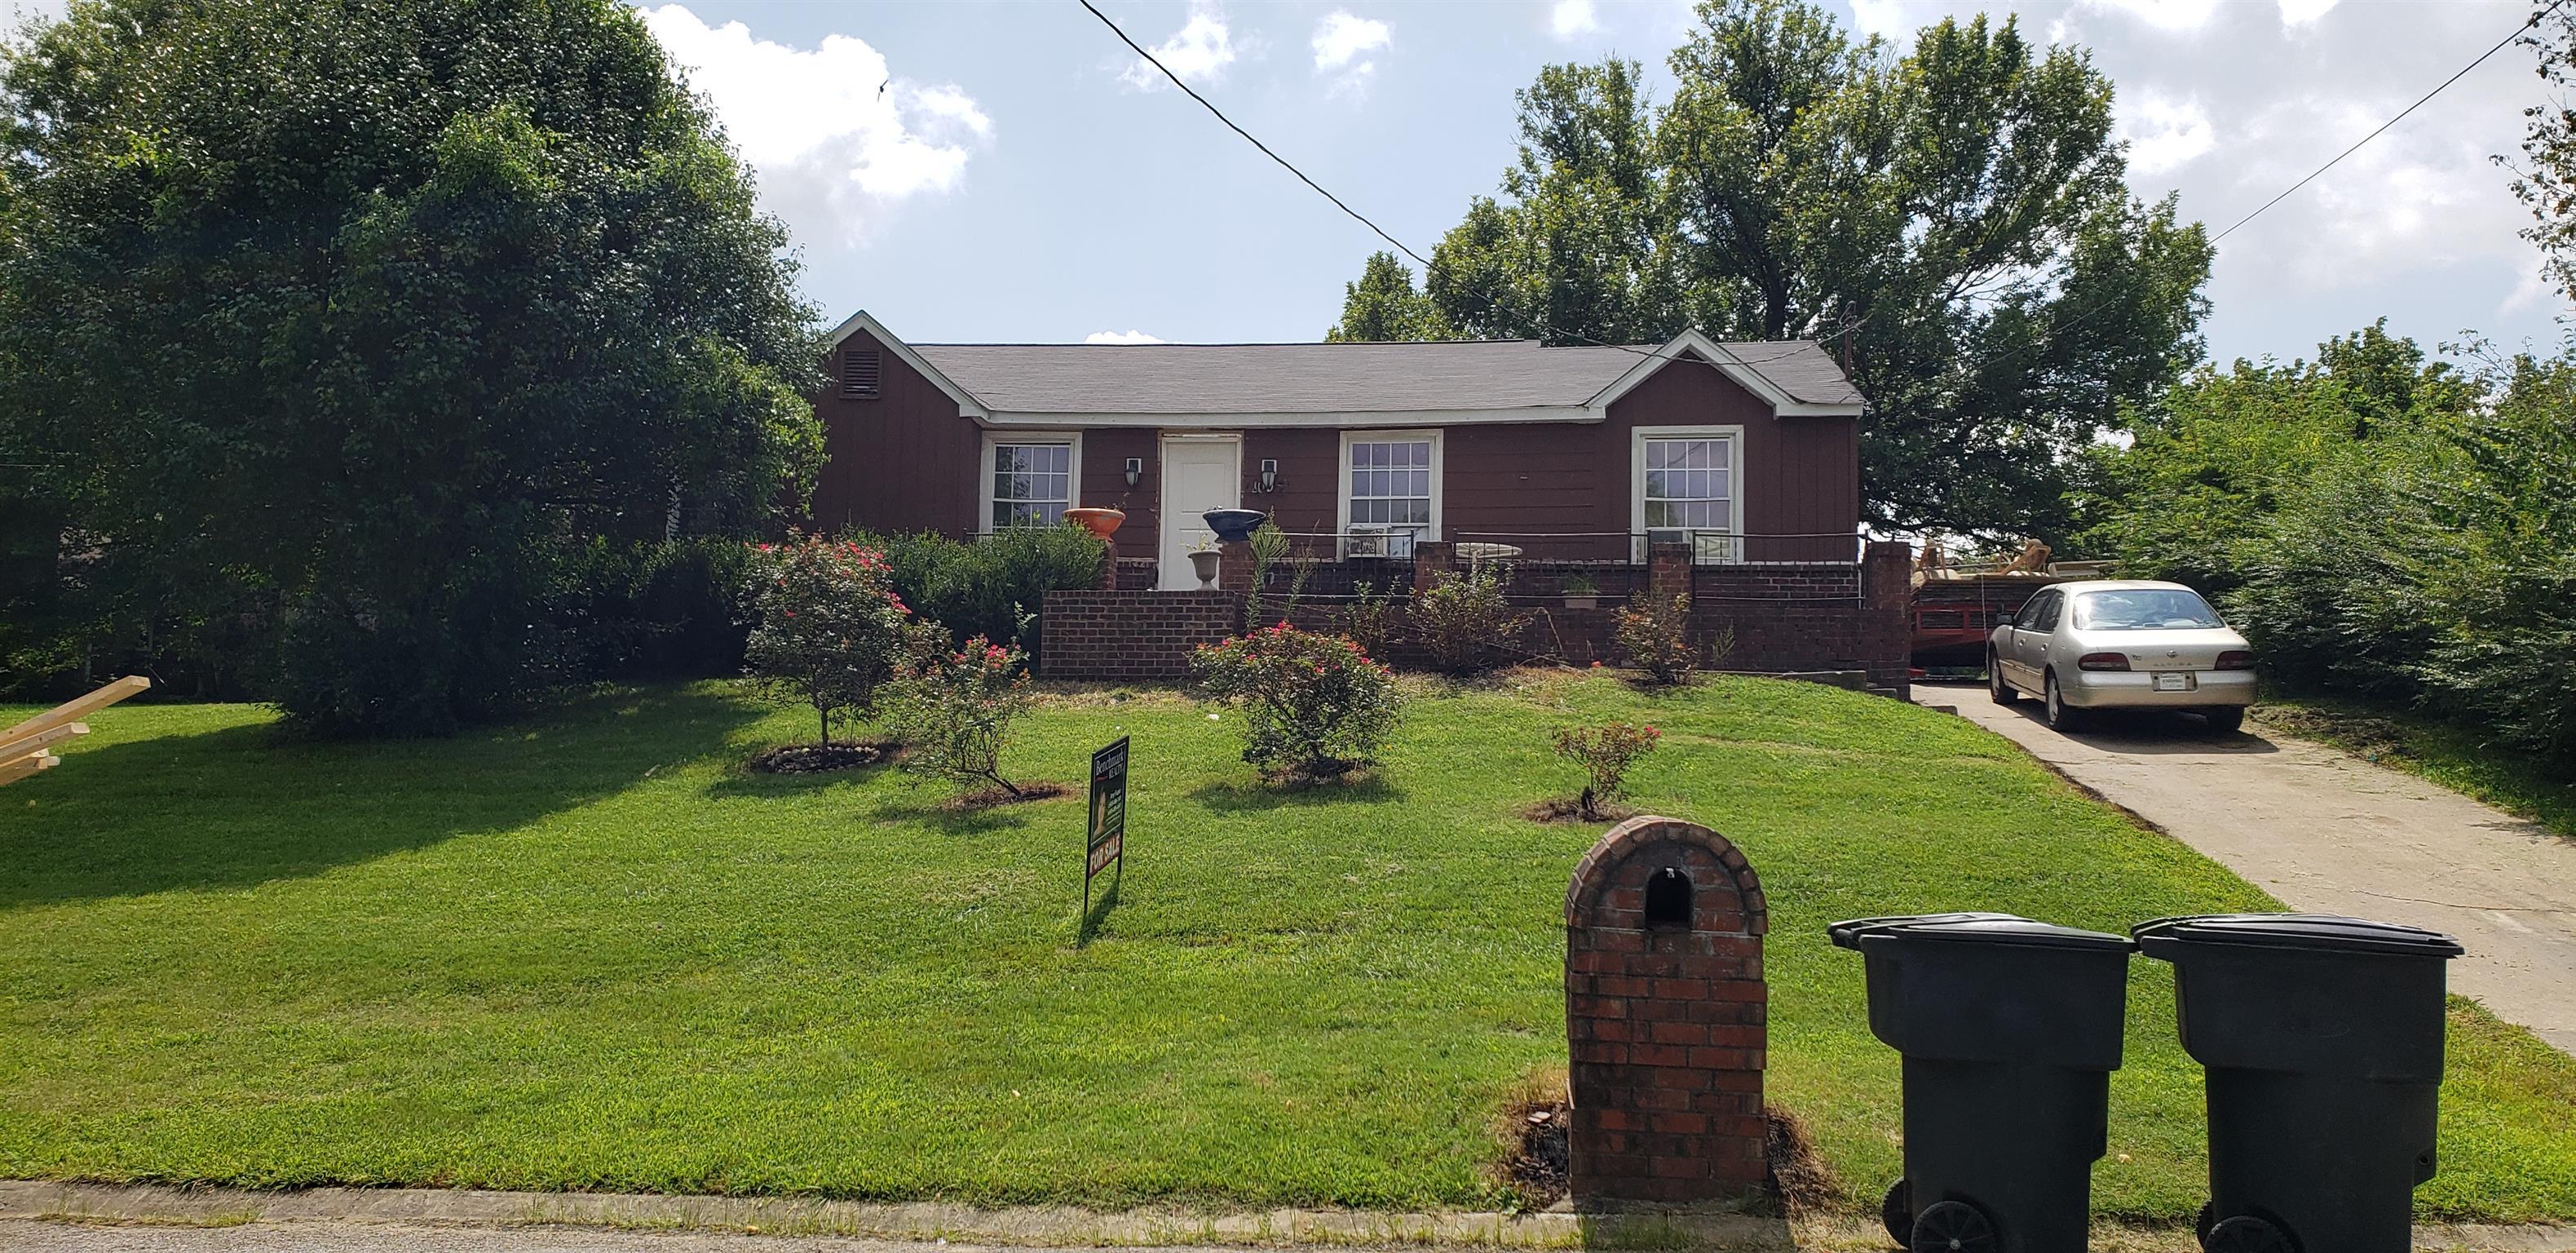 109 Woodland Ct, Hendersonville, TN 37075 - Hendersonville, TN real estate listing